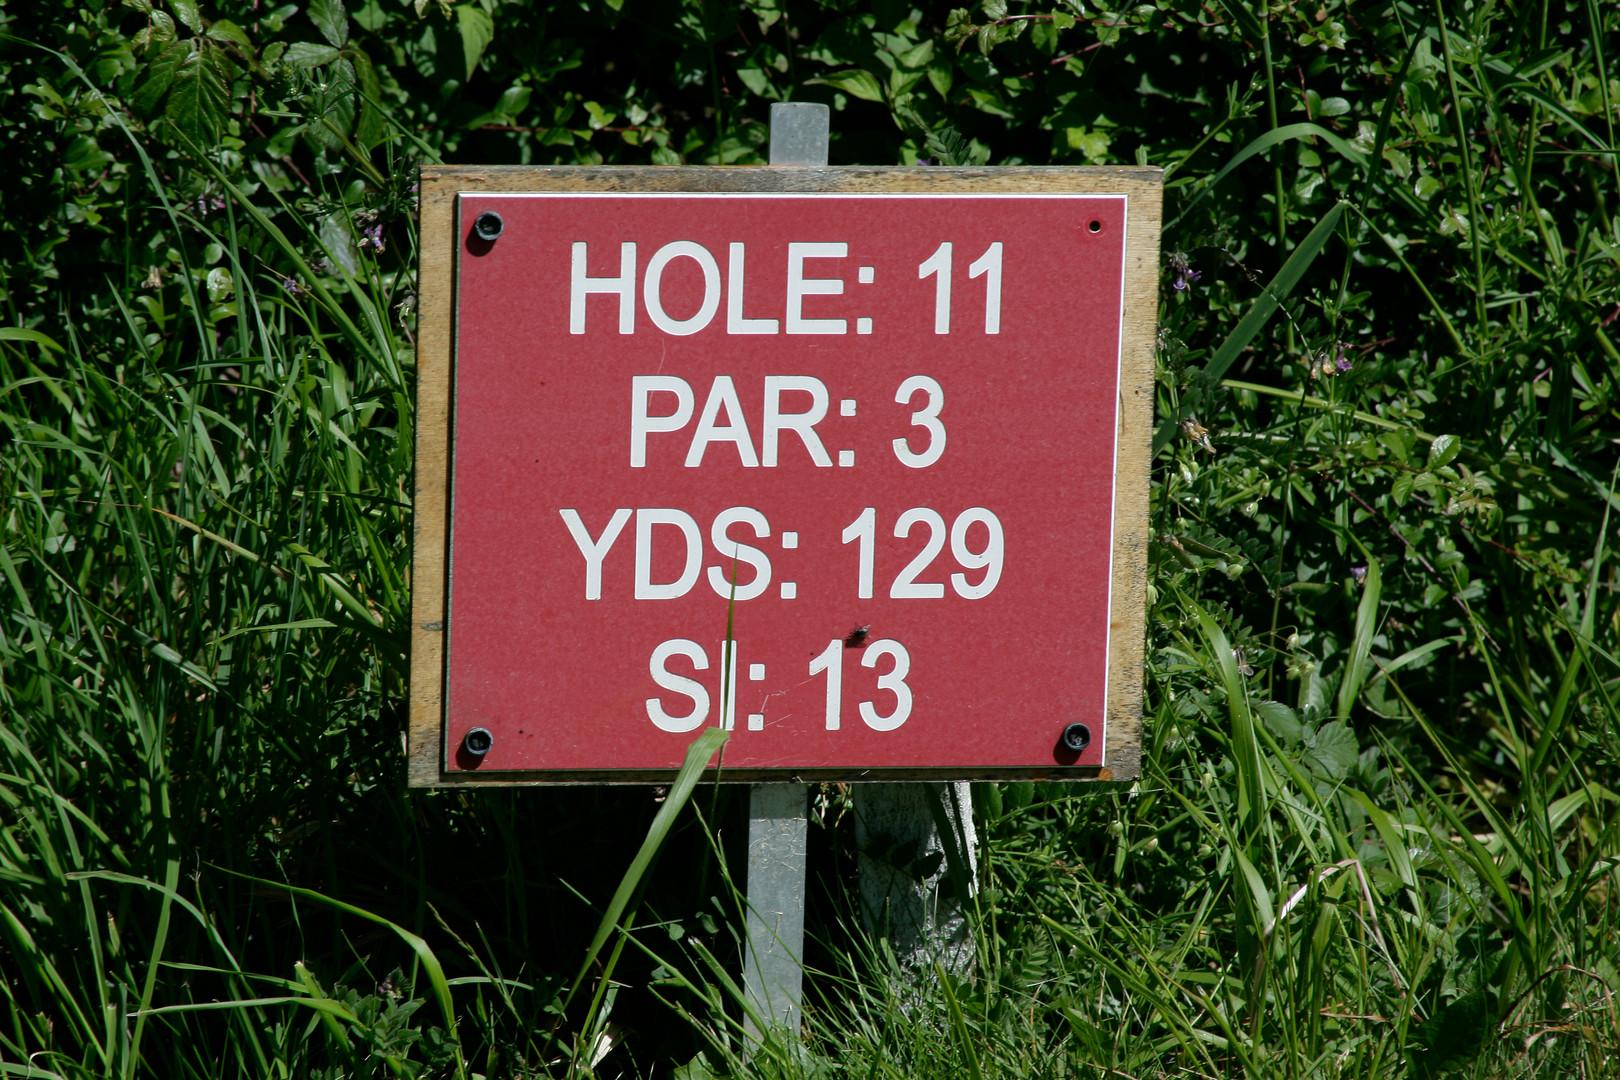 026 - Hole 11.JPG